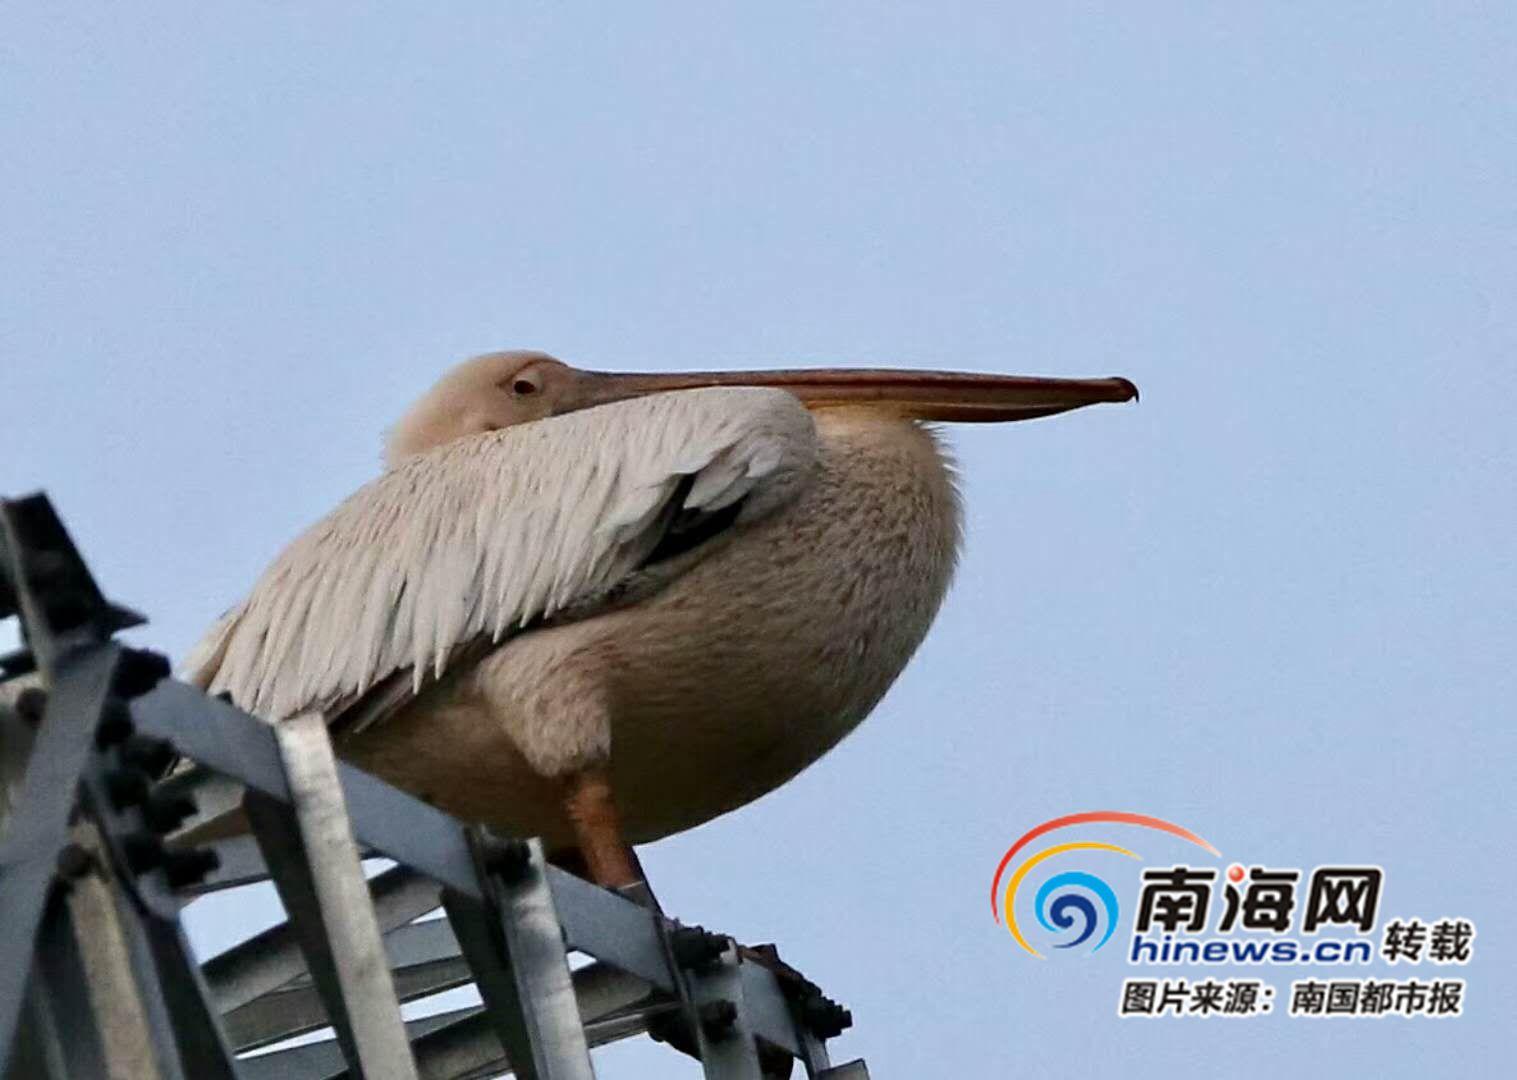 <b>看清脸了!白鹈鹕飞来海口美仁坡村民成立巡逻队跟踪保护</b>